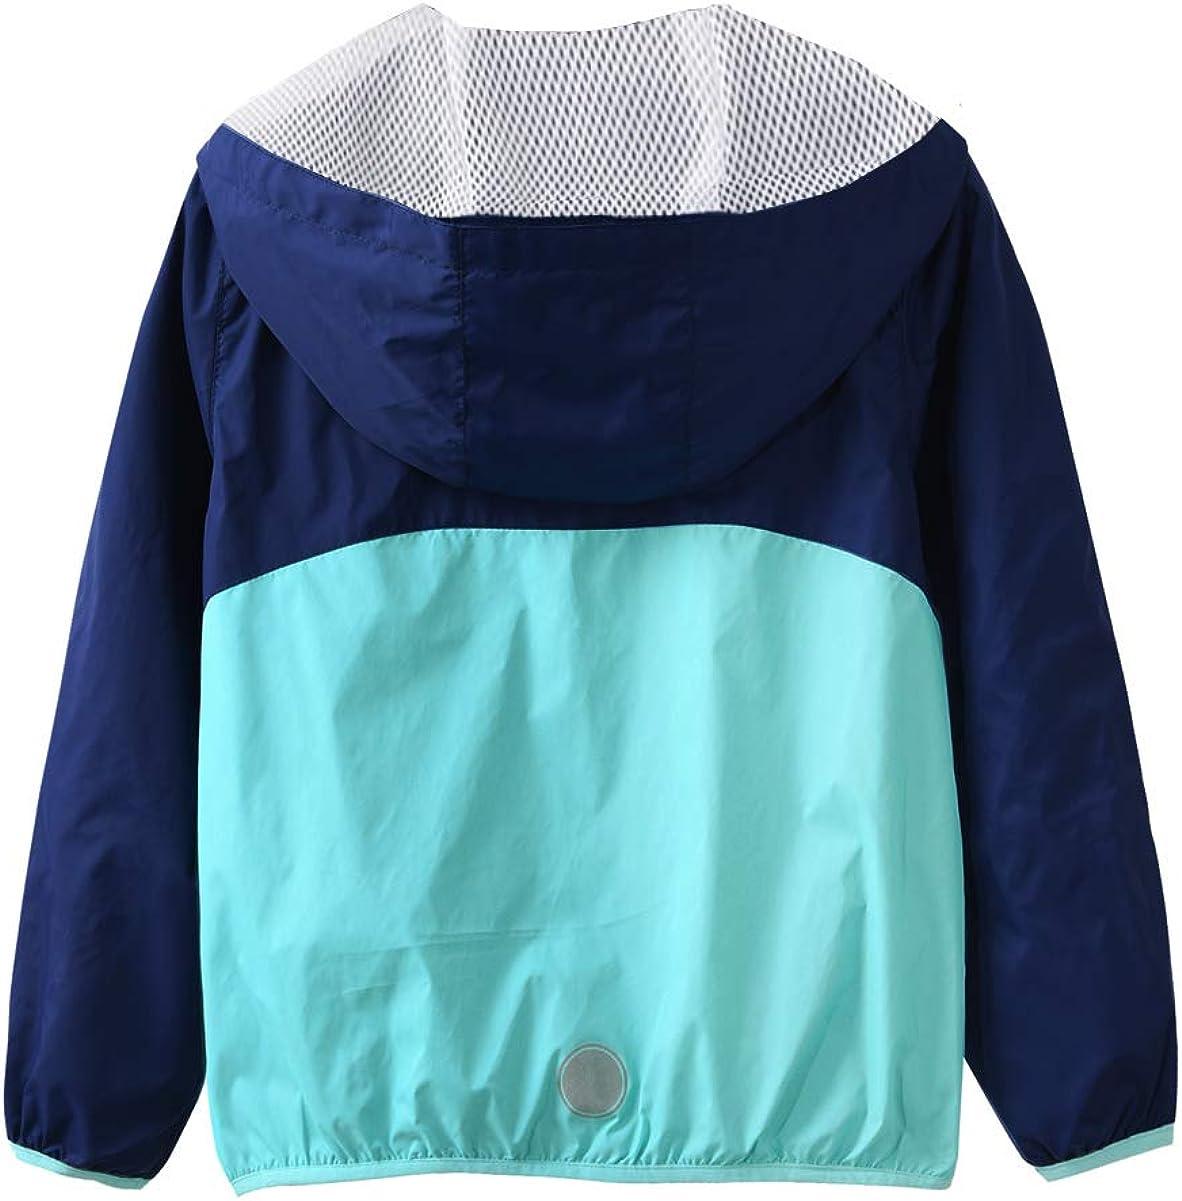 M2C Boys /& Girls Raincoat Hooded Jacket Outdoor Light Windbreaker